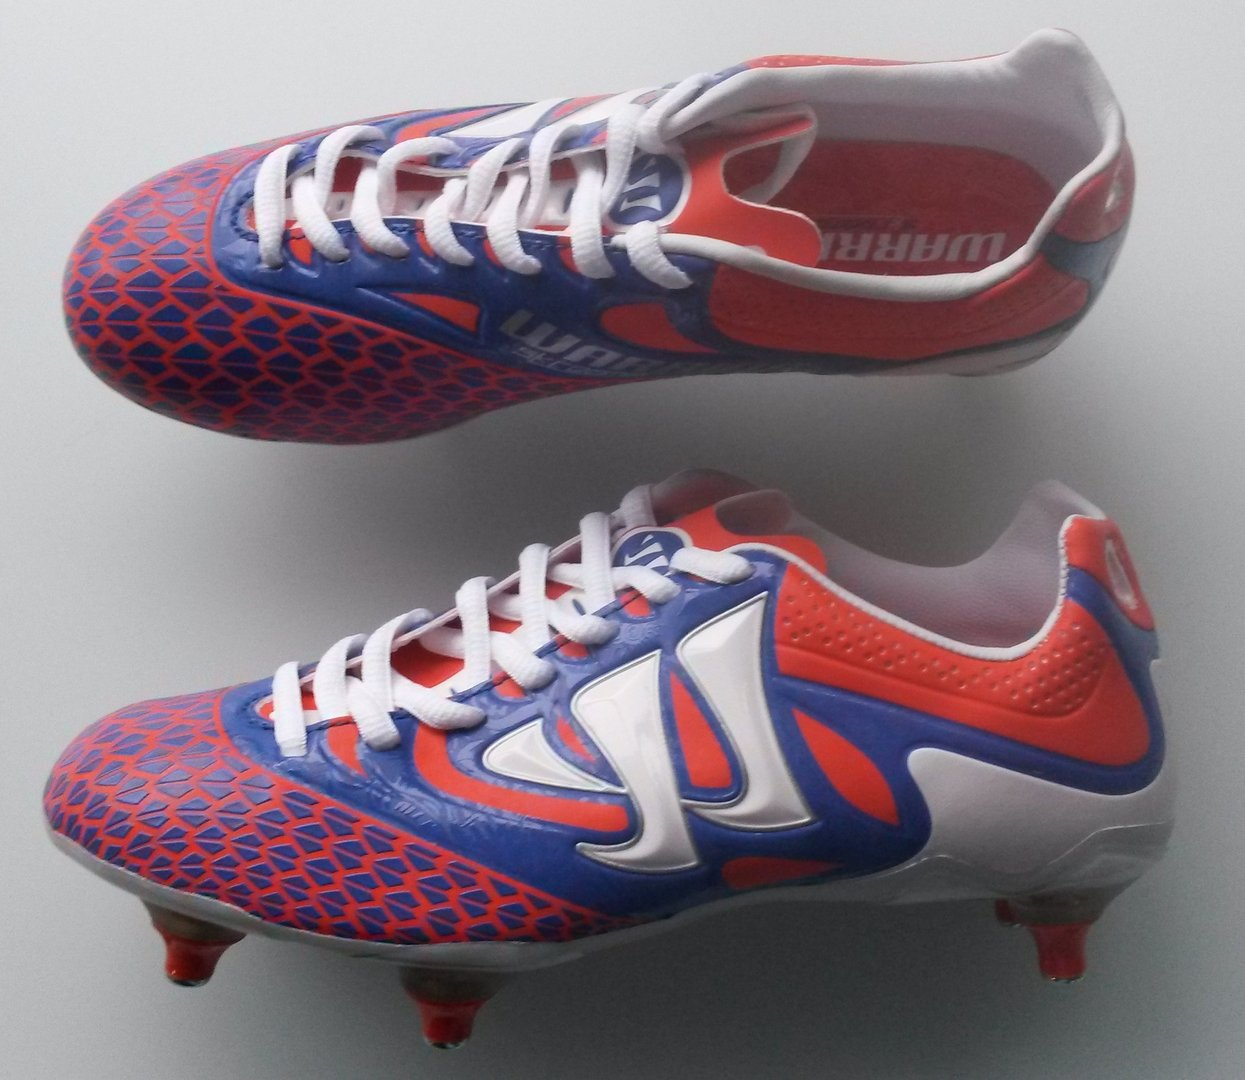 19dd01be77d3 (428) Warrior Skreamer football boots size 2 BNIB